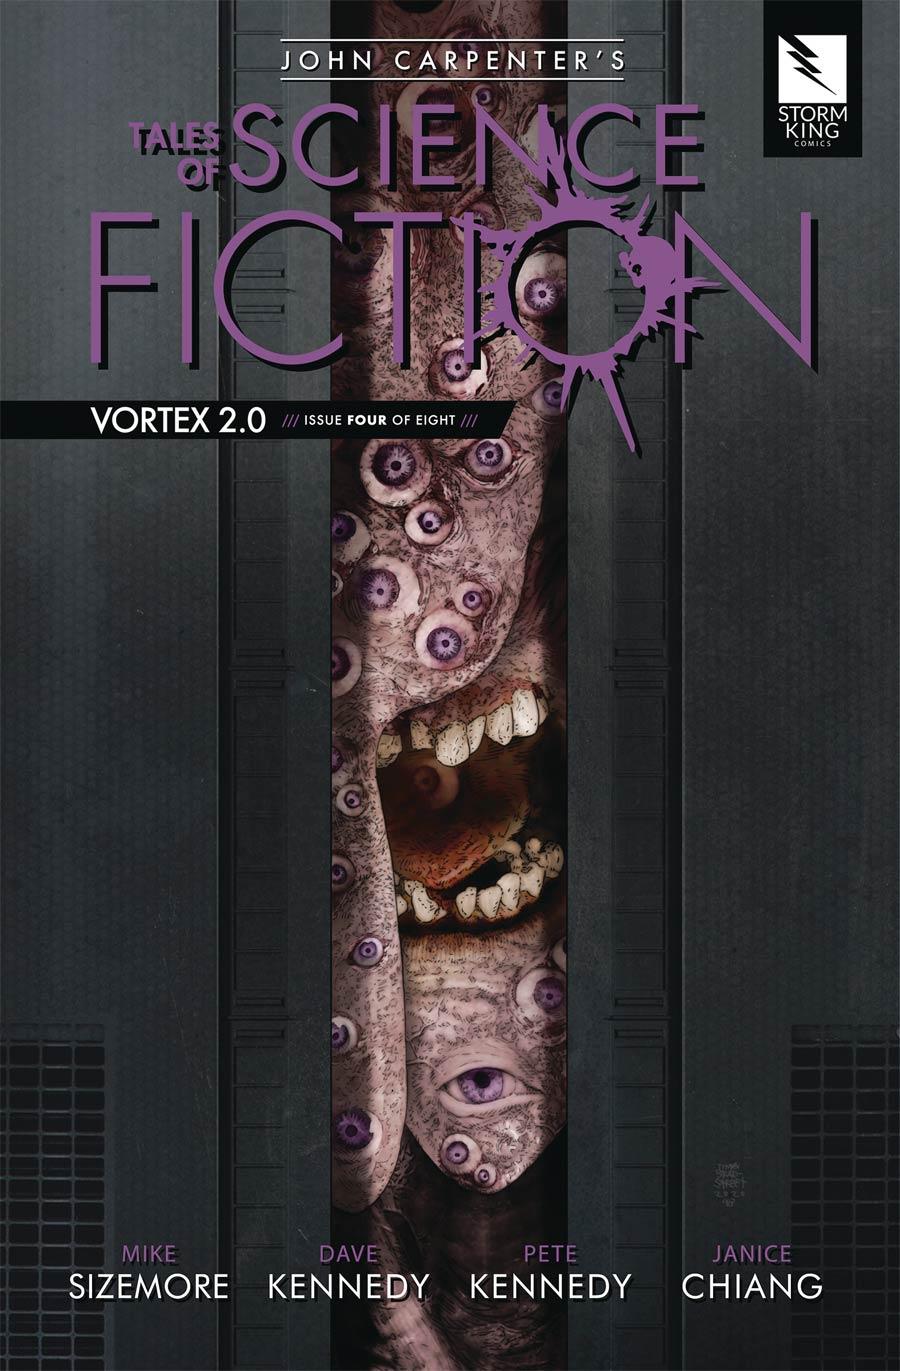 John Carpenters Tales Of Science Fiction Vortex 2.0 #4